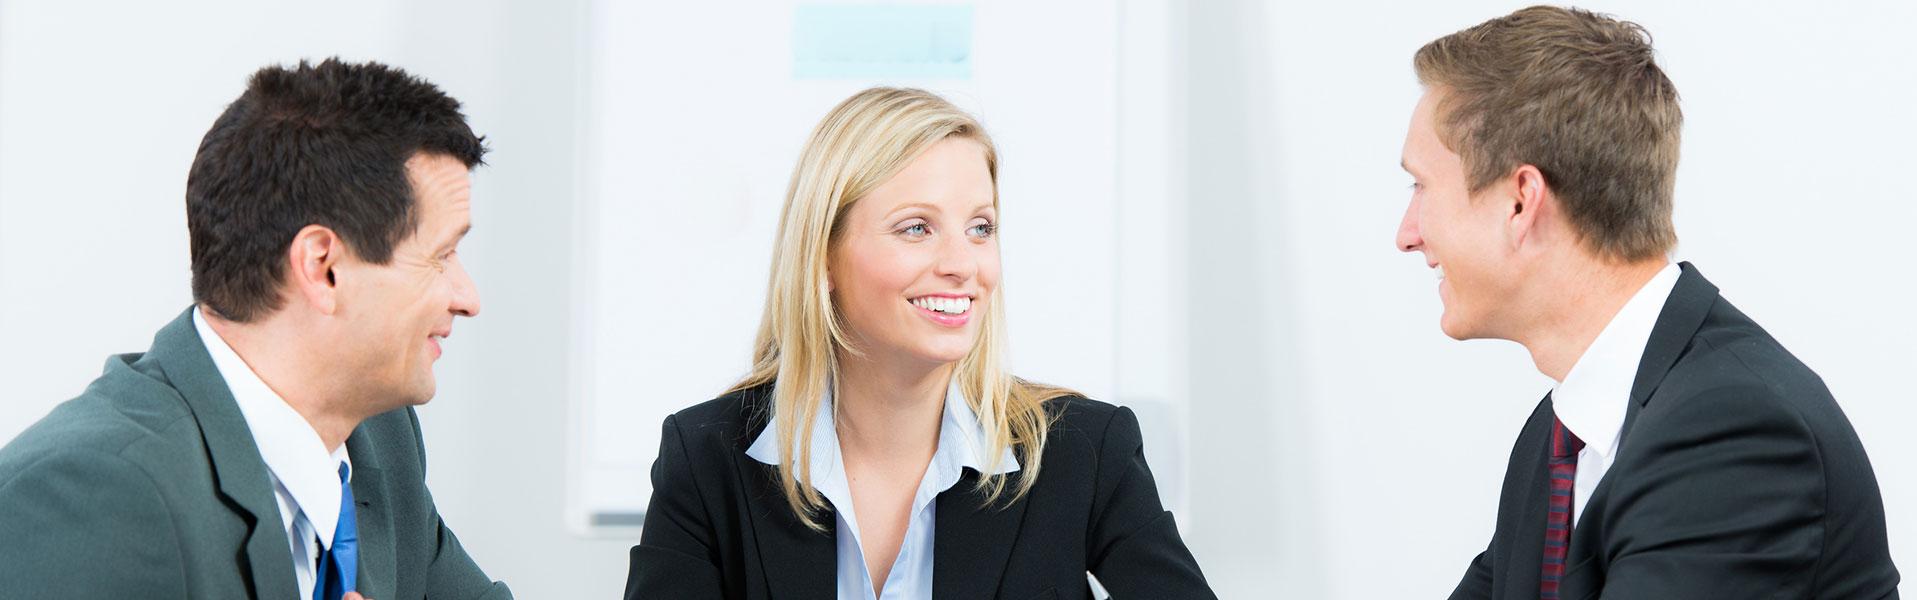 PMB International GmbH: Personalberatung, Recruiting, Coaching, Personalmarketing und HR-Organisationsberatung